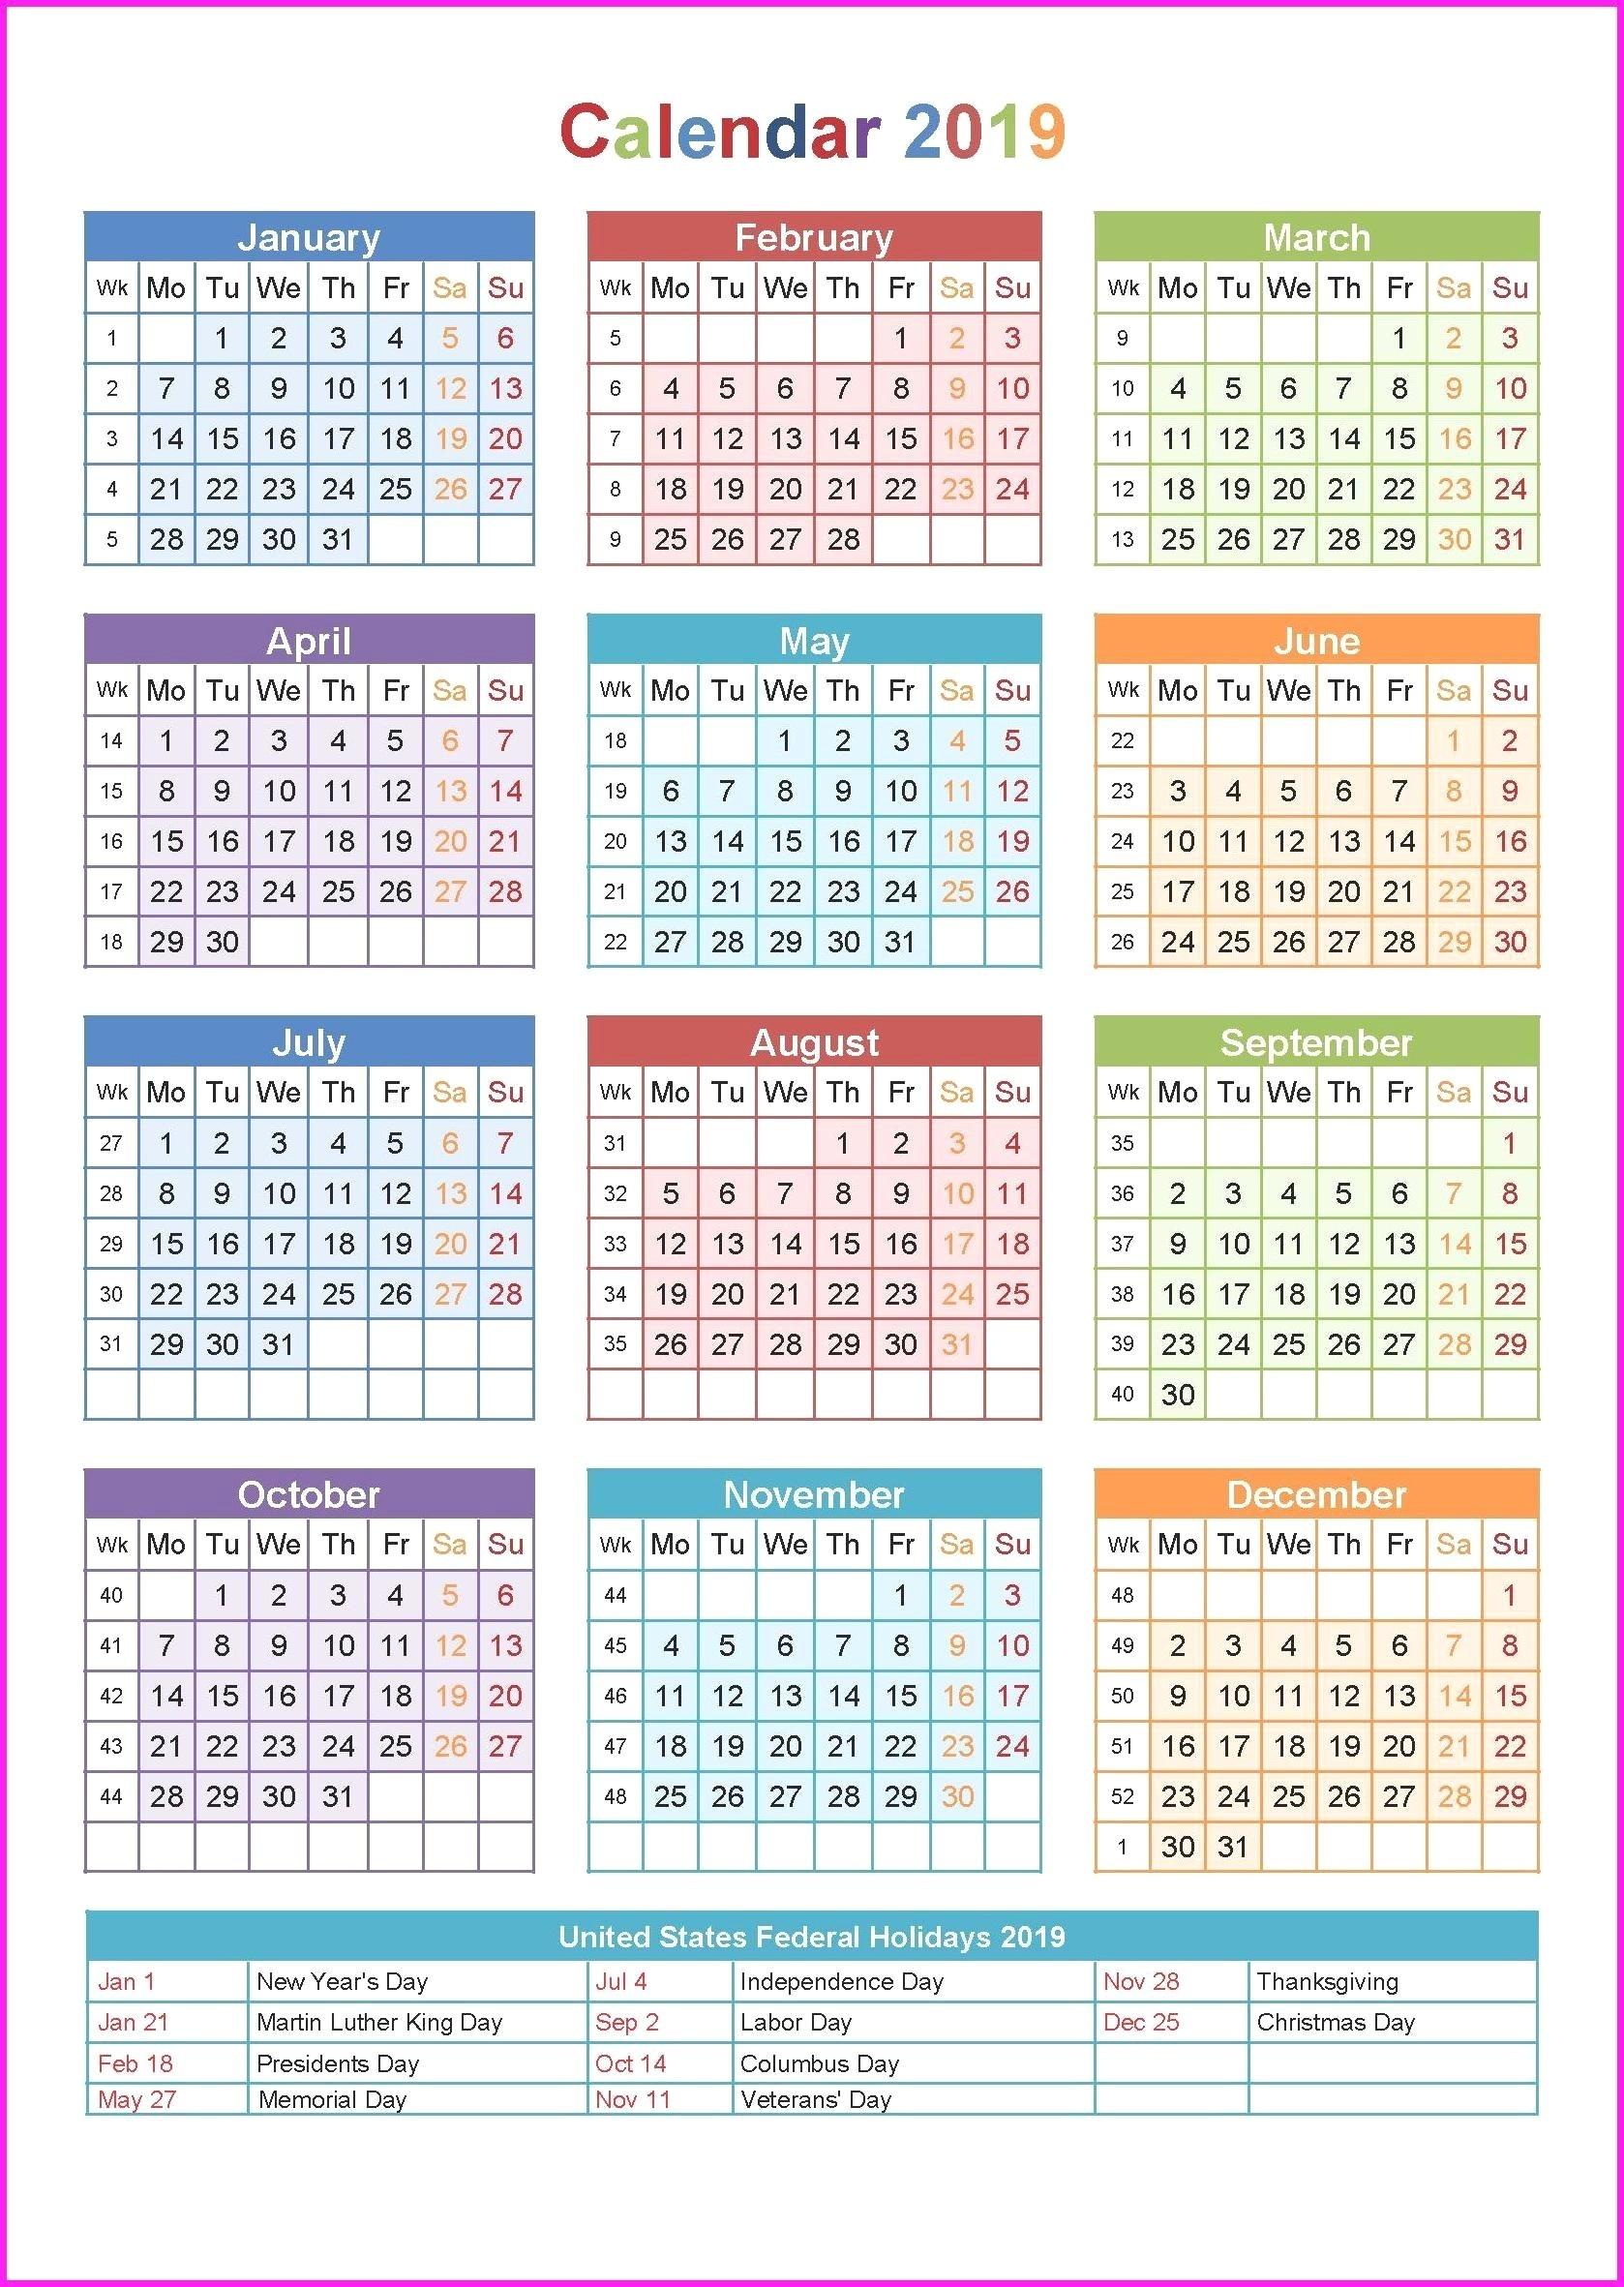 Hindu Calendar 2019 | Jcreview  Septmber Calendar 2020 Thithi Hindi Me